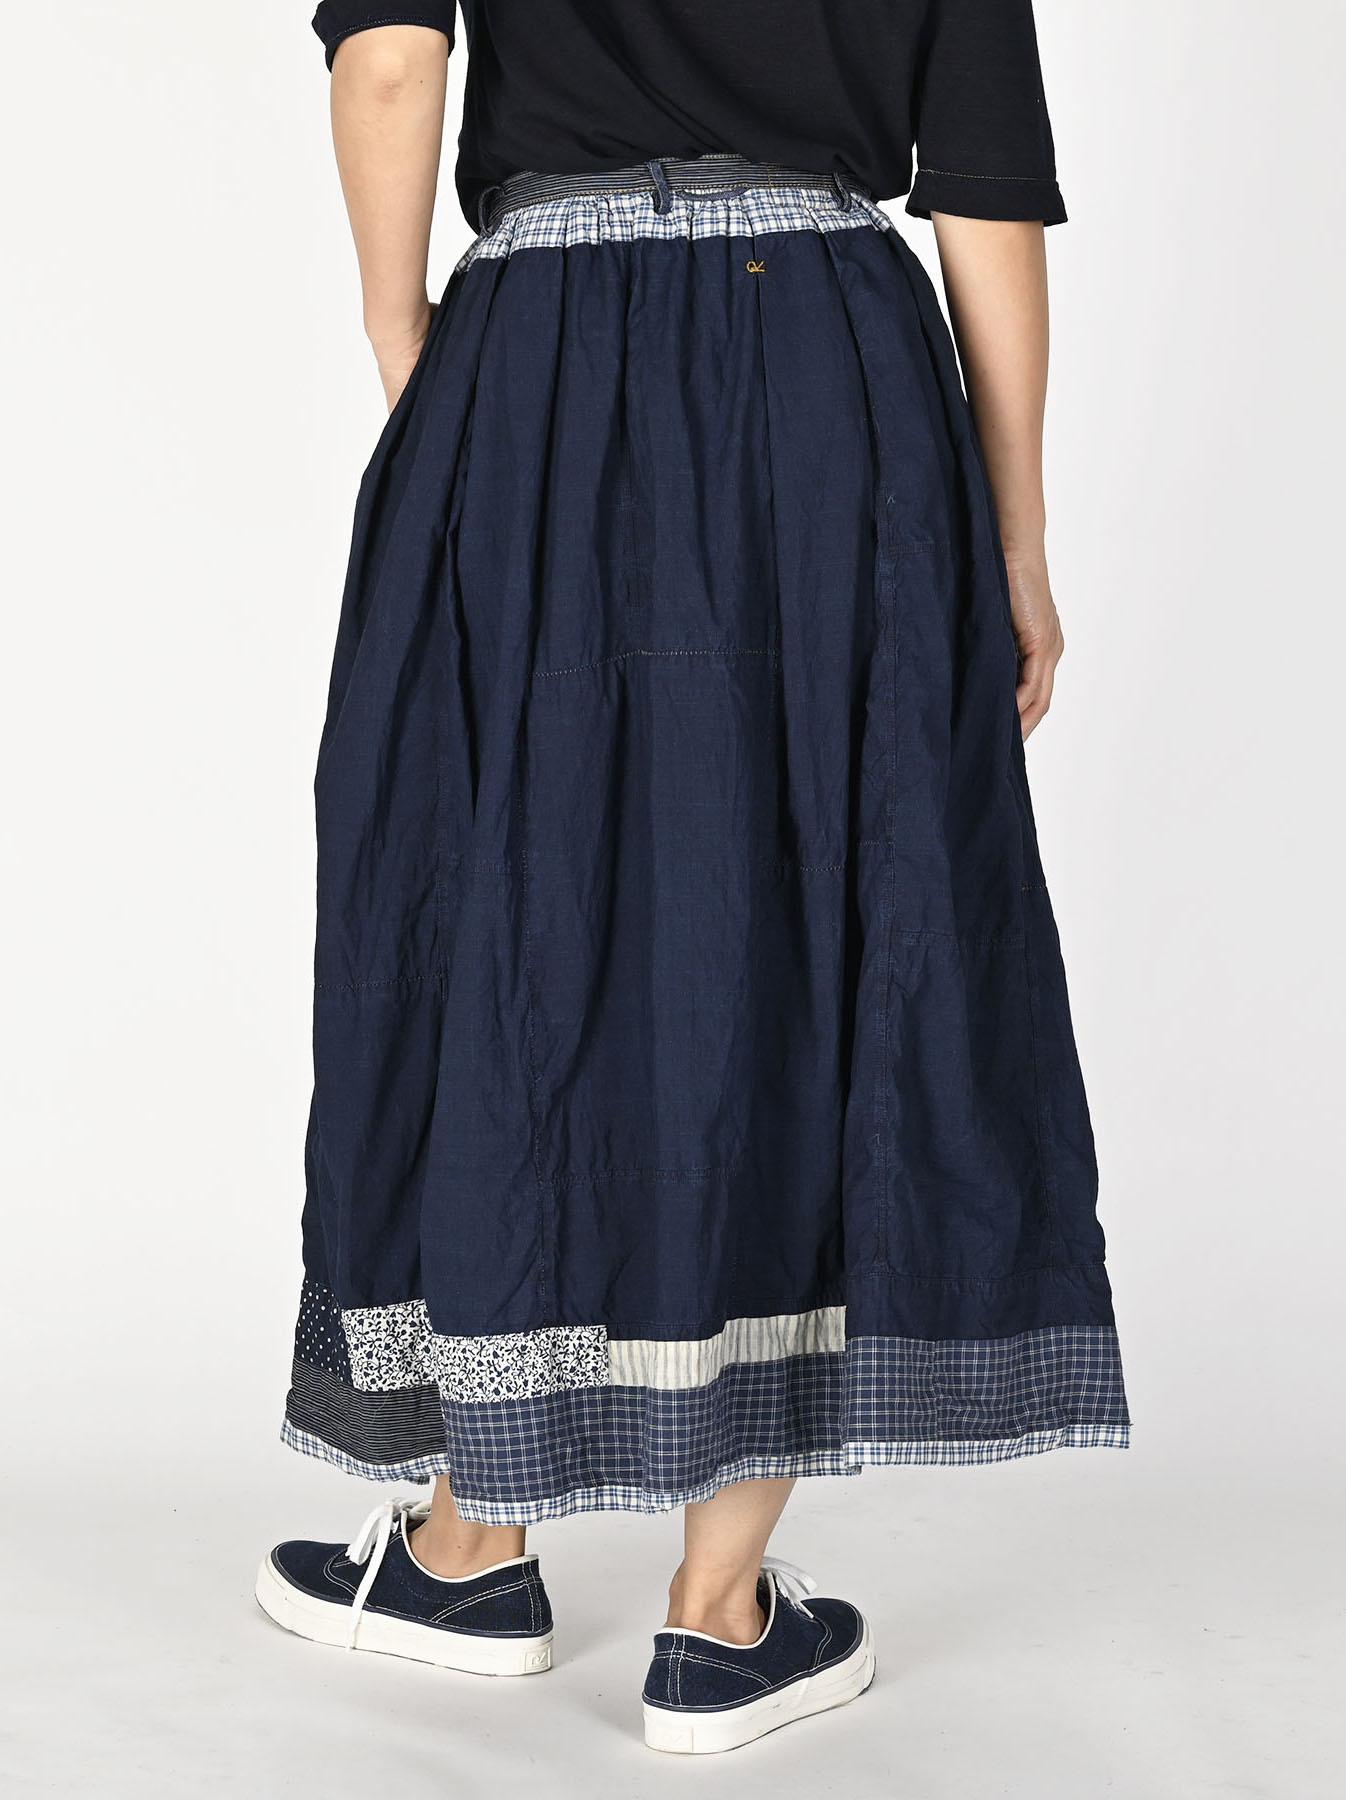 Indigo Tappet Patchwork Skirt-5